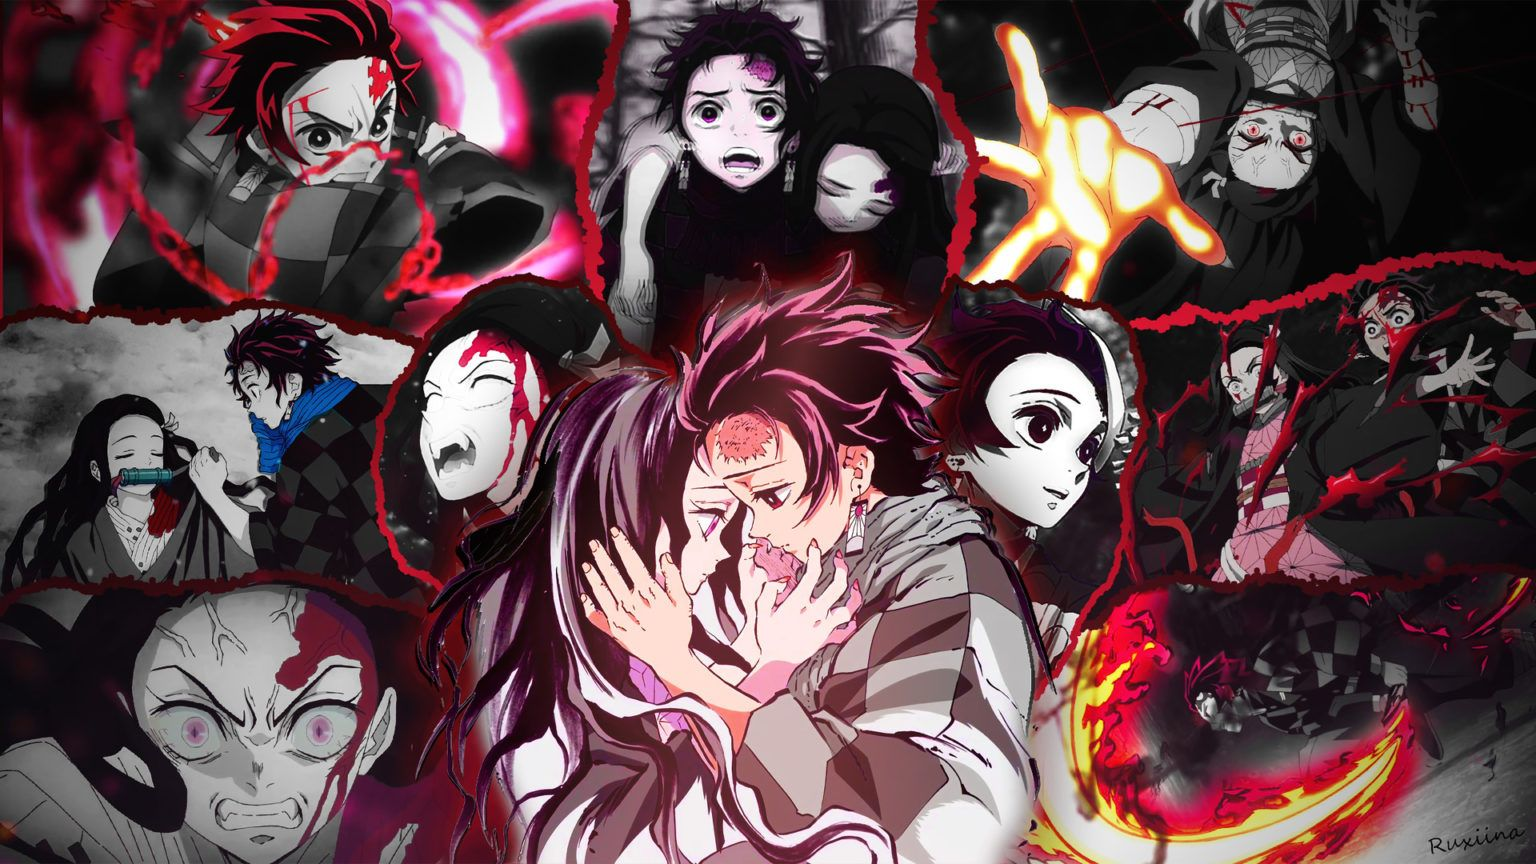 Best Demon Slayer Tanjiro Kamado Hd Wallpaper 2020 Di 2020 Animasi Mitologi Jepang Grafik